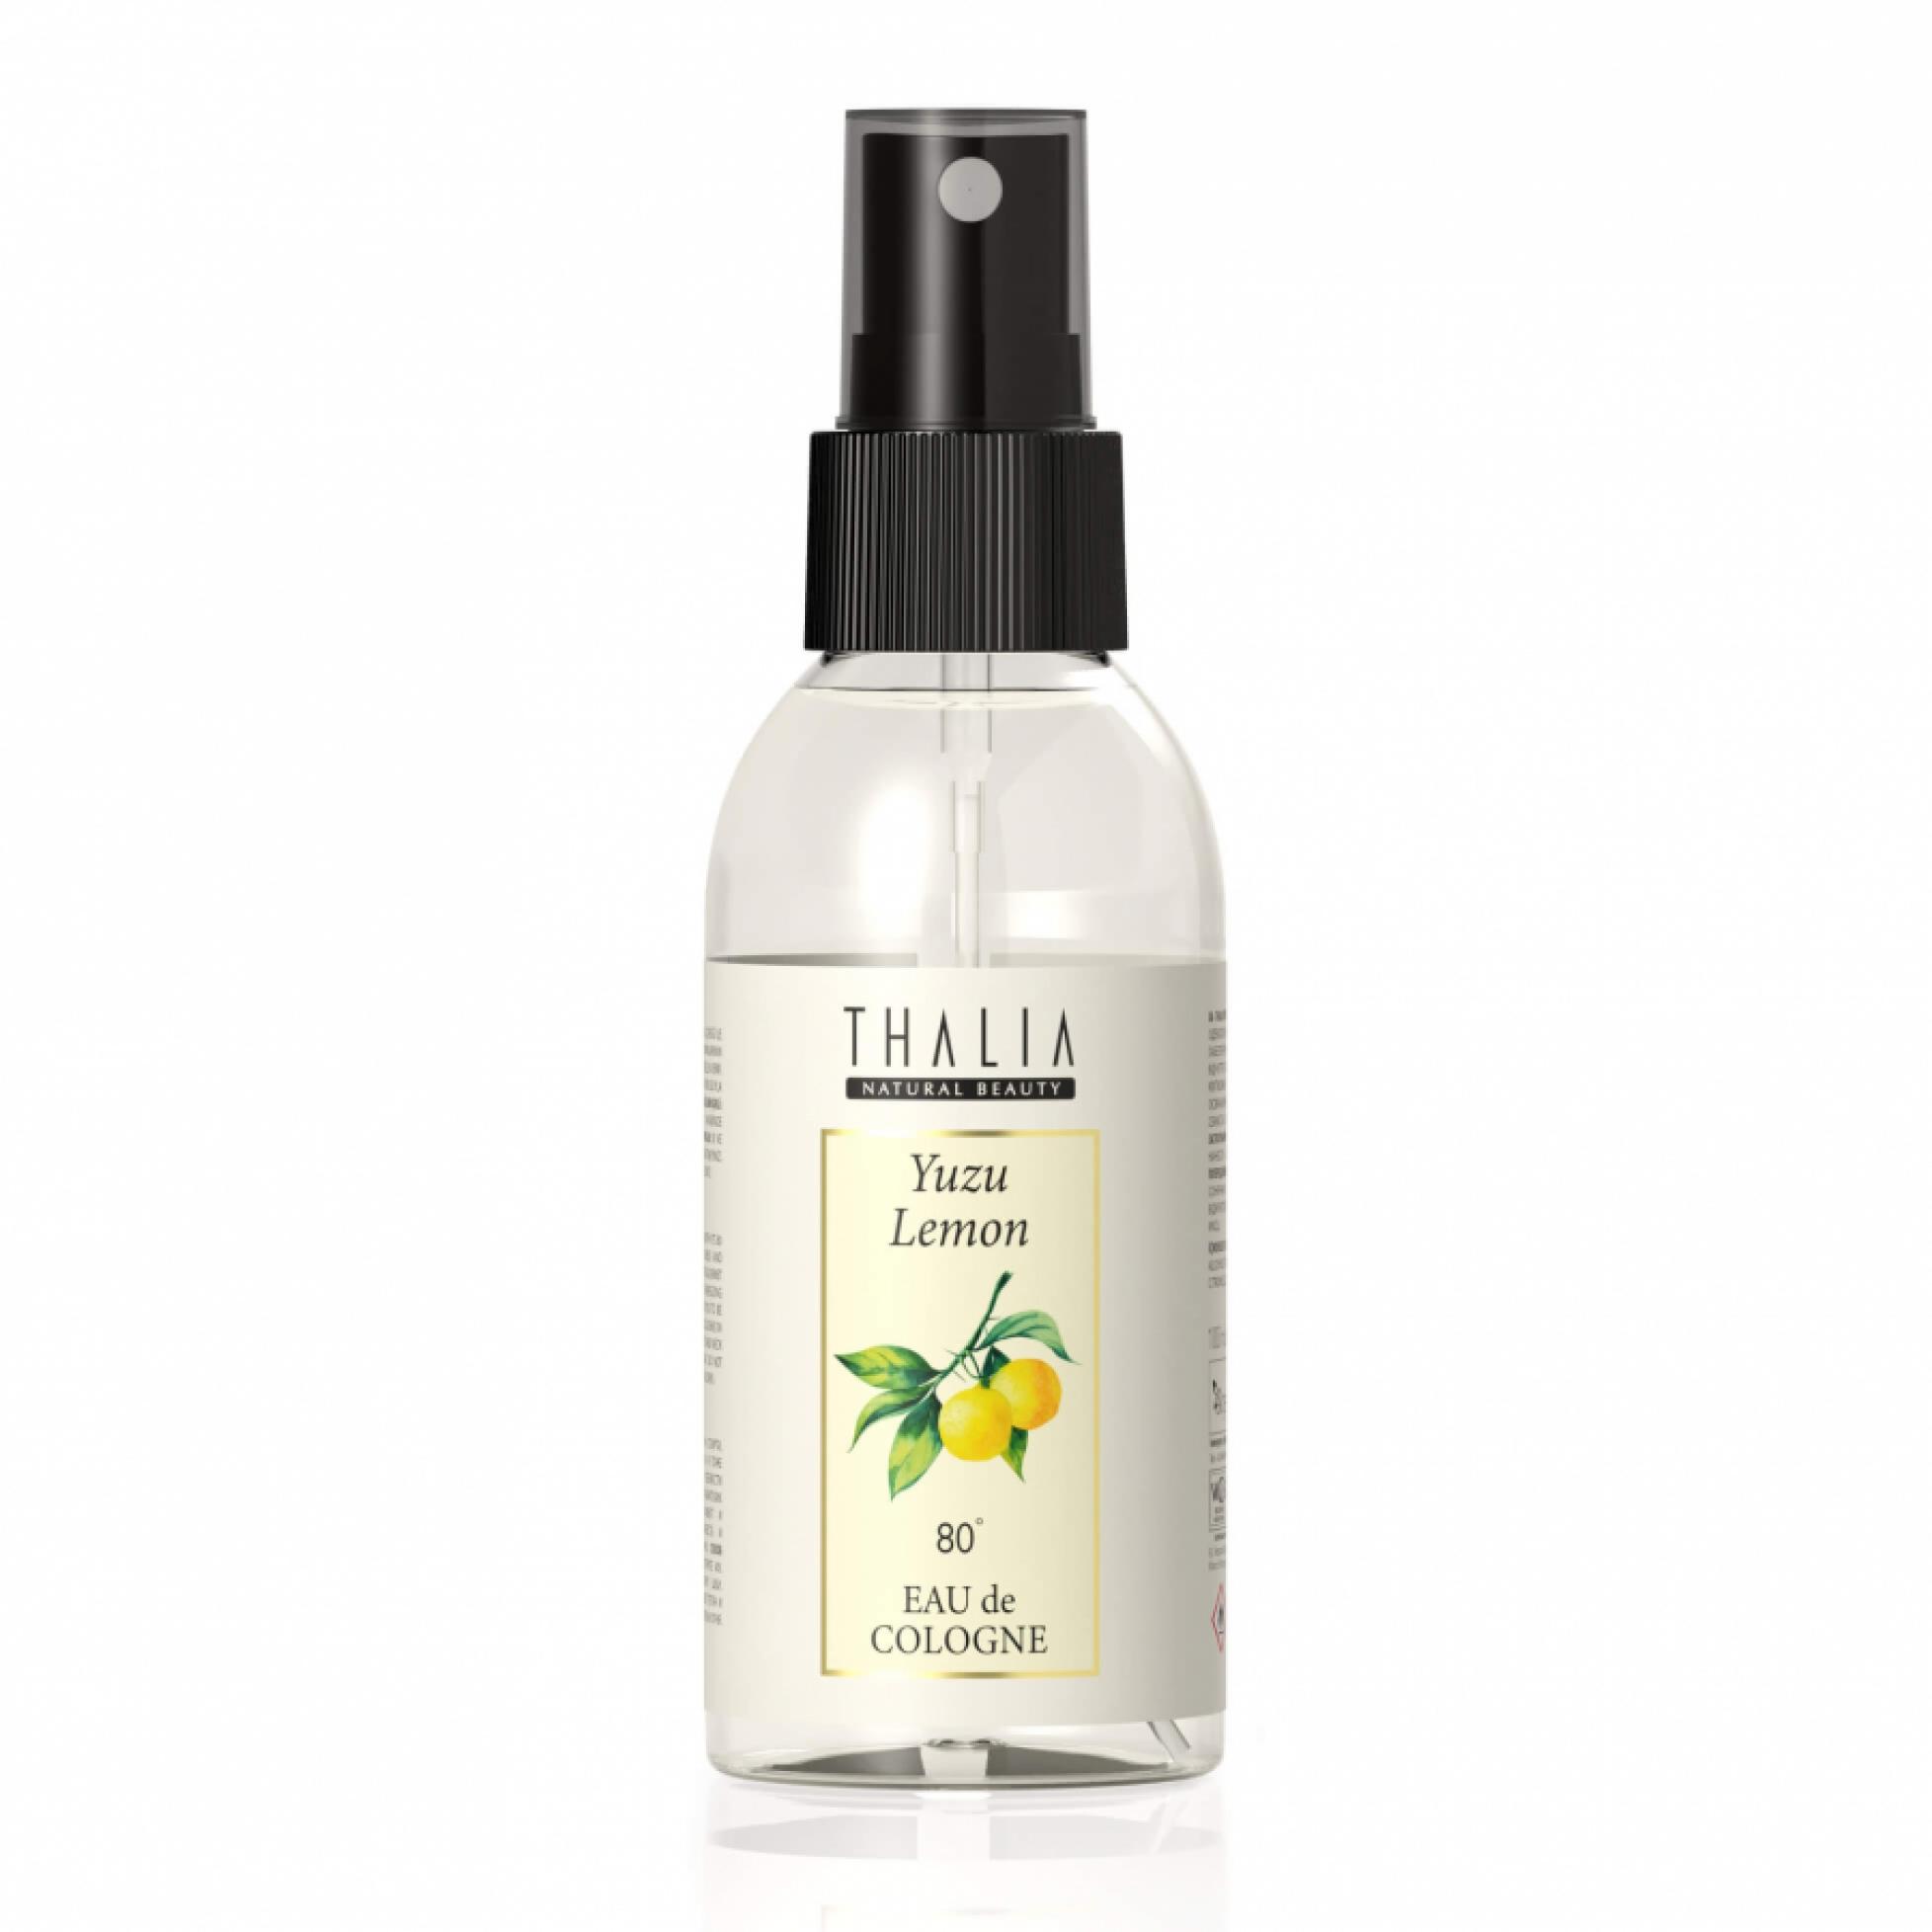 Thalia Yüzü Sprey Limon Kolonyası 100 ml